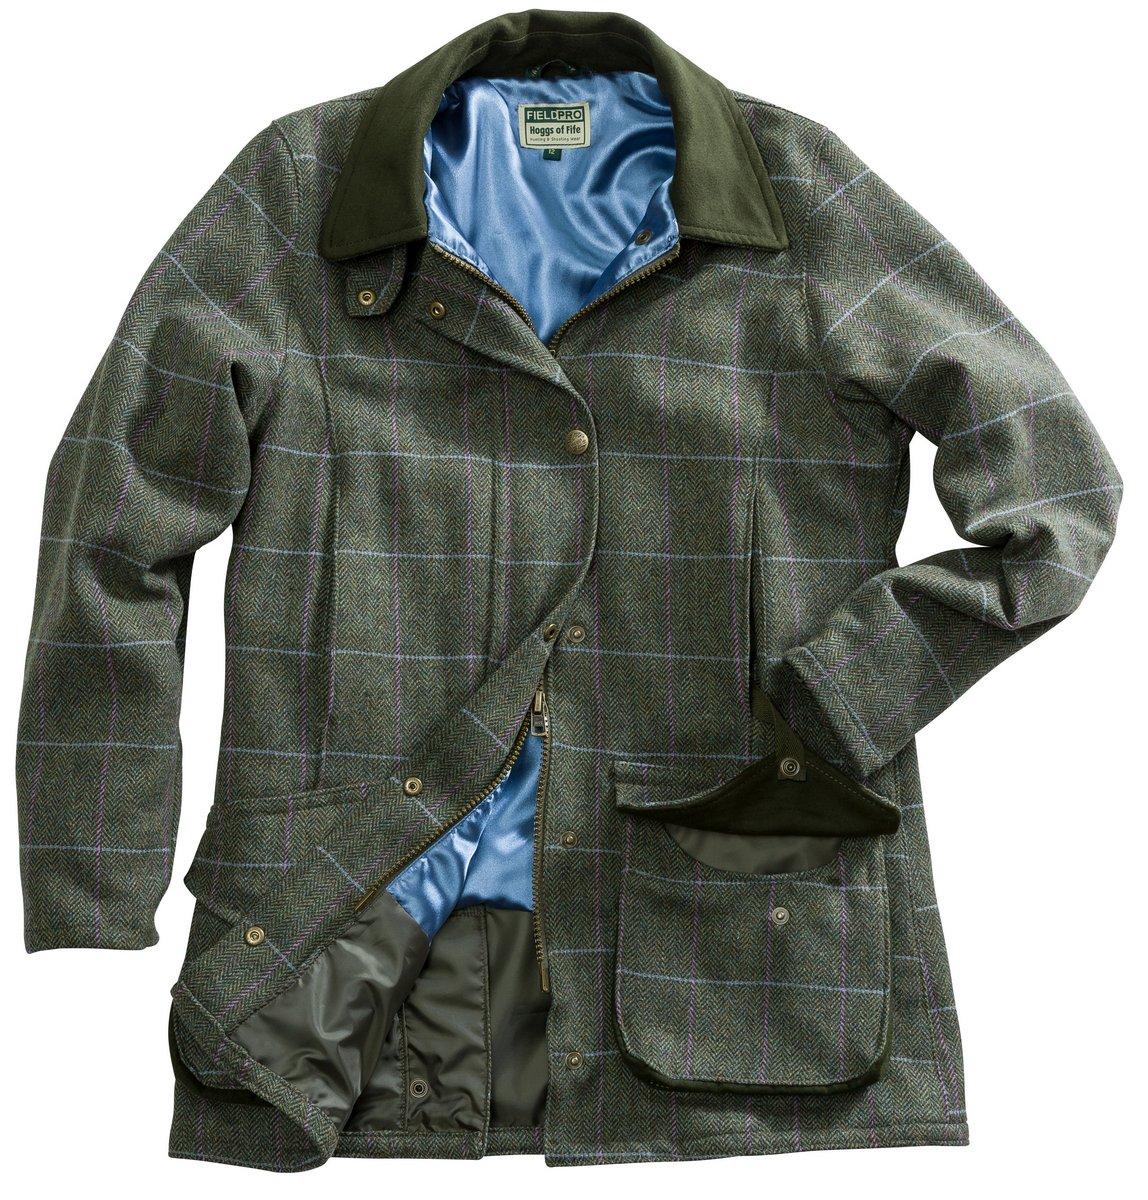 Albany Tweed Shooting Jacket